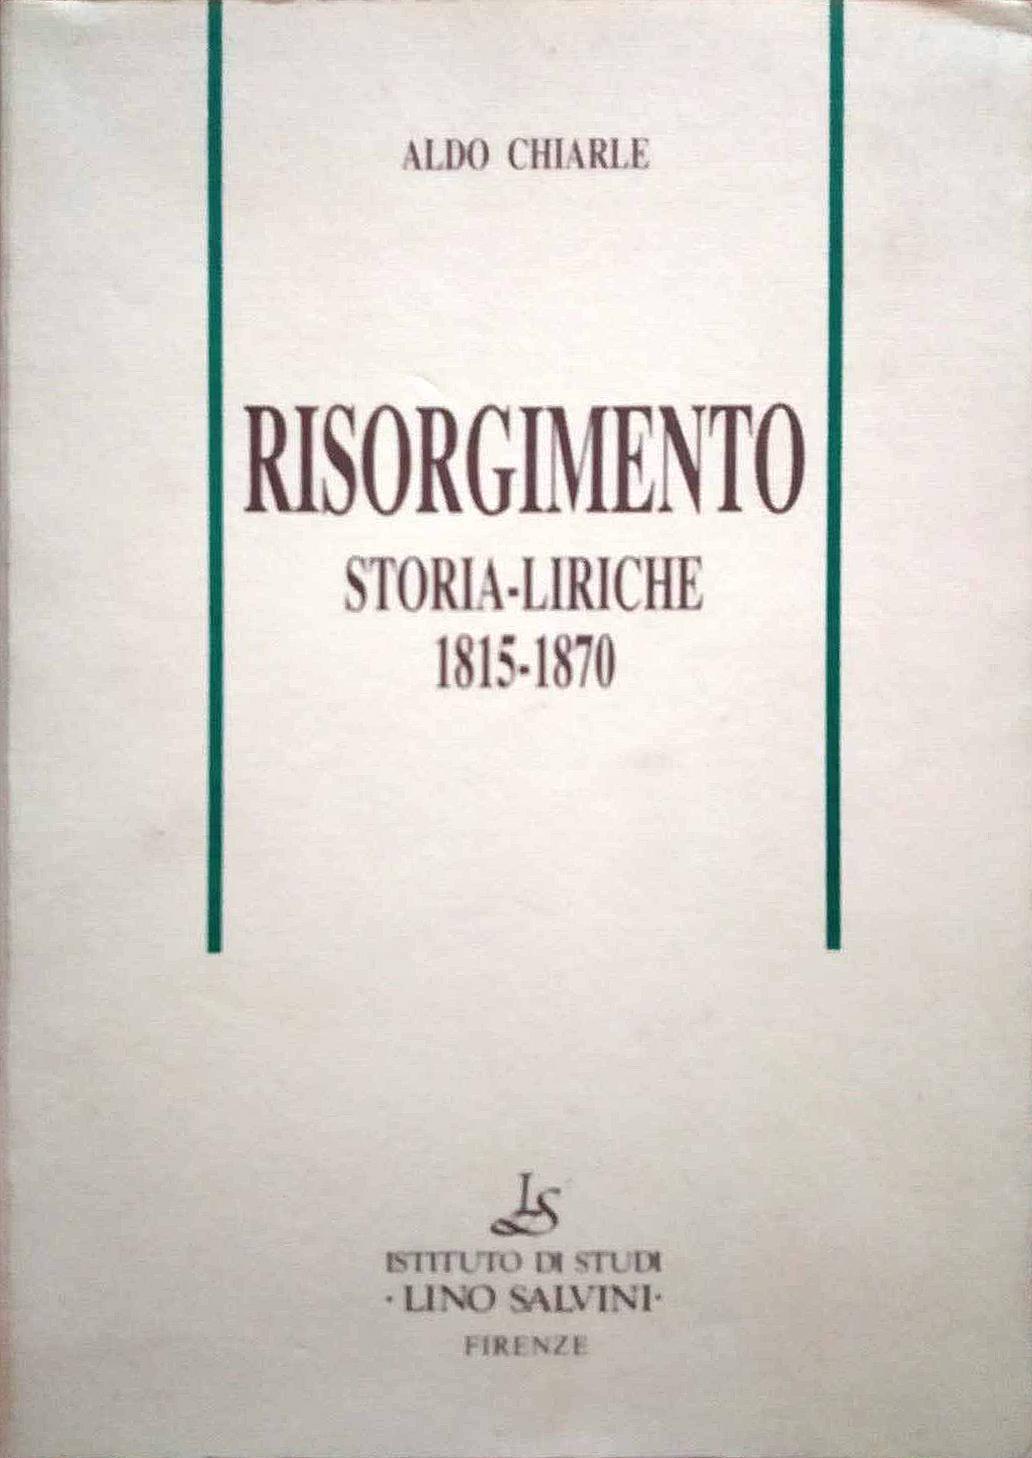 Risorgimento. Storia - Liriche 1815-1870